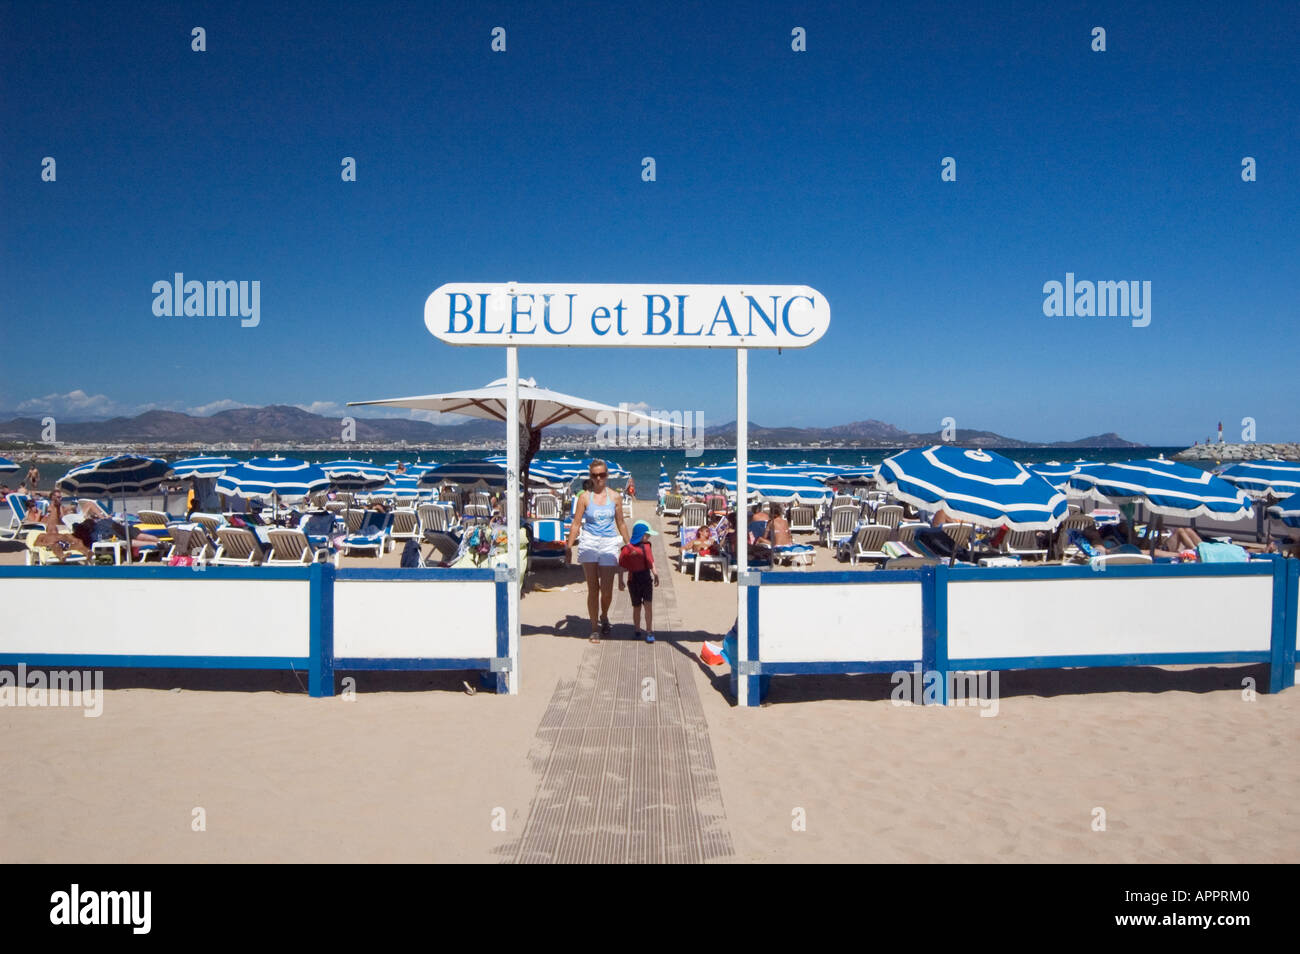 Bleu et Blanc Beach Club St Aygulf Provence France - Stock Image